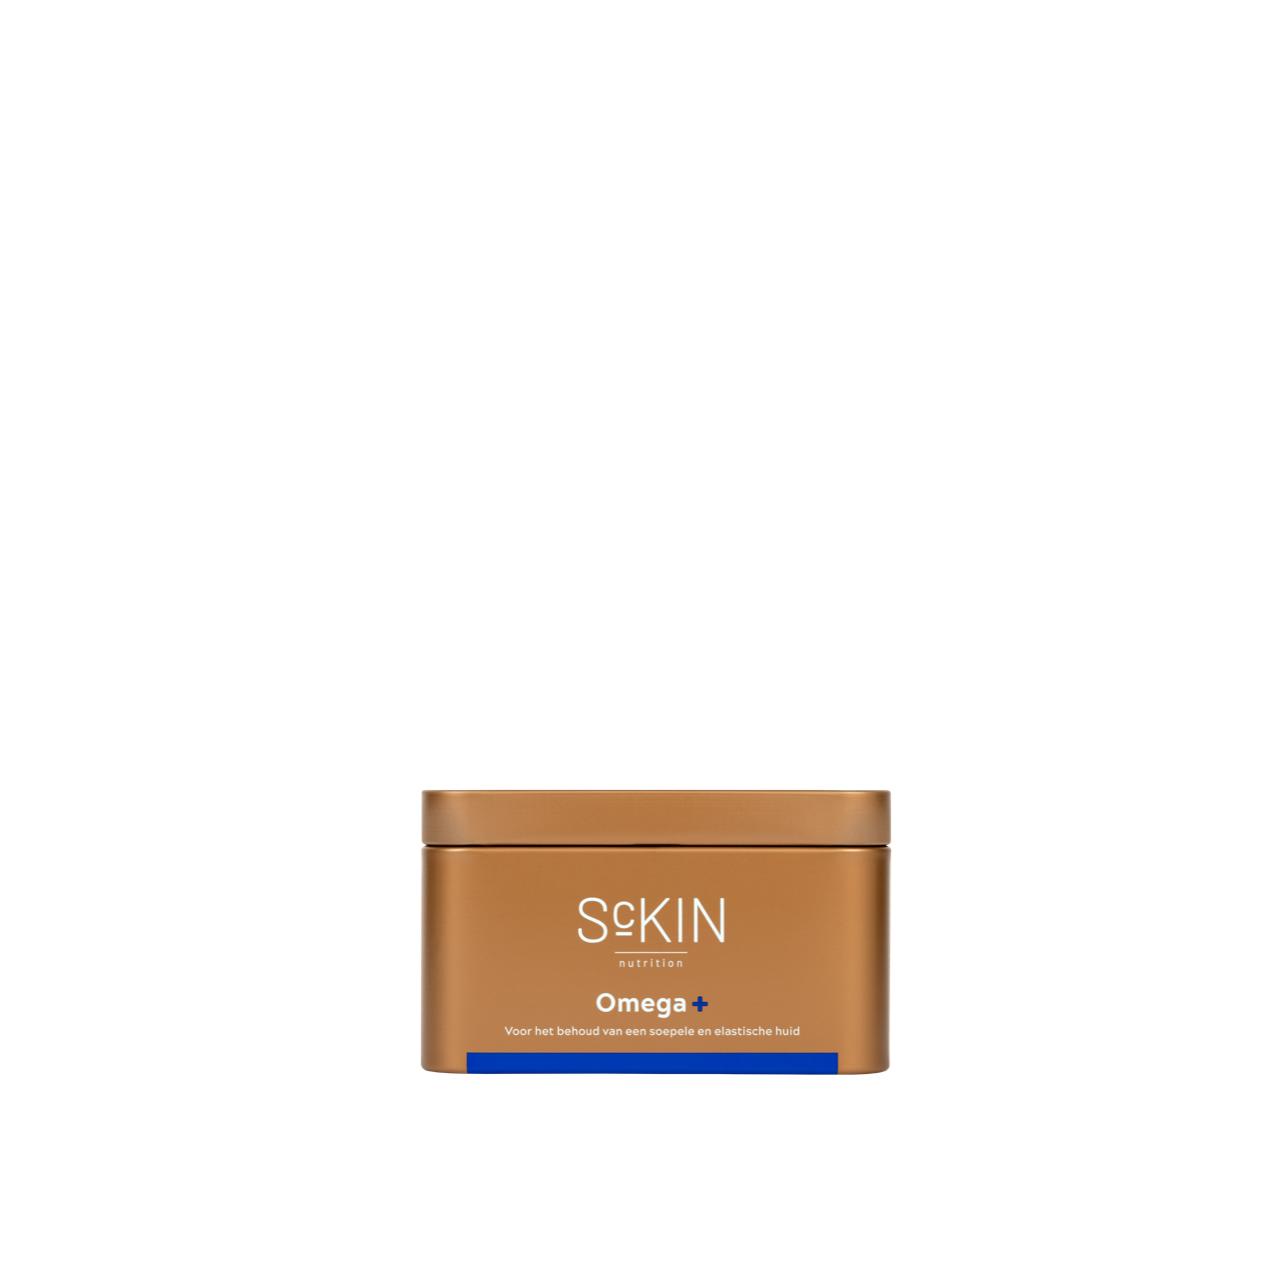 Sckin nutrition Omega+